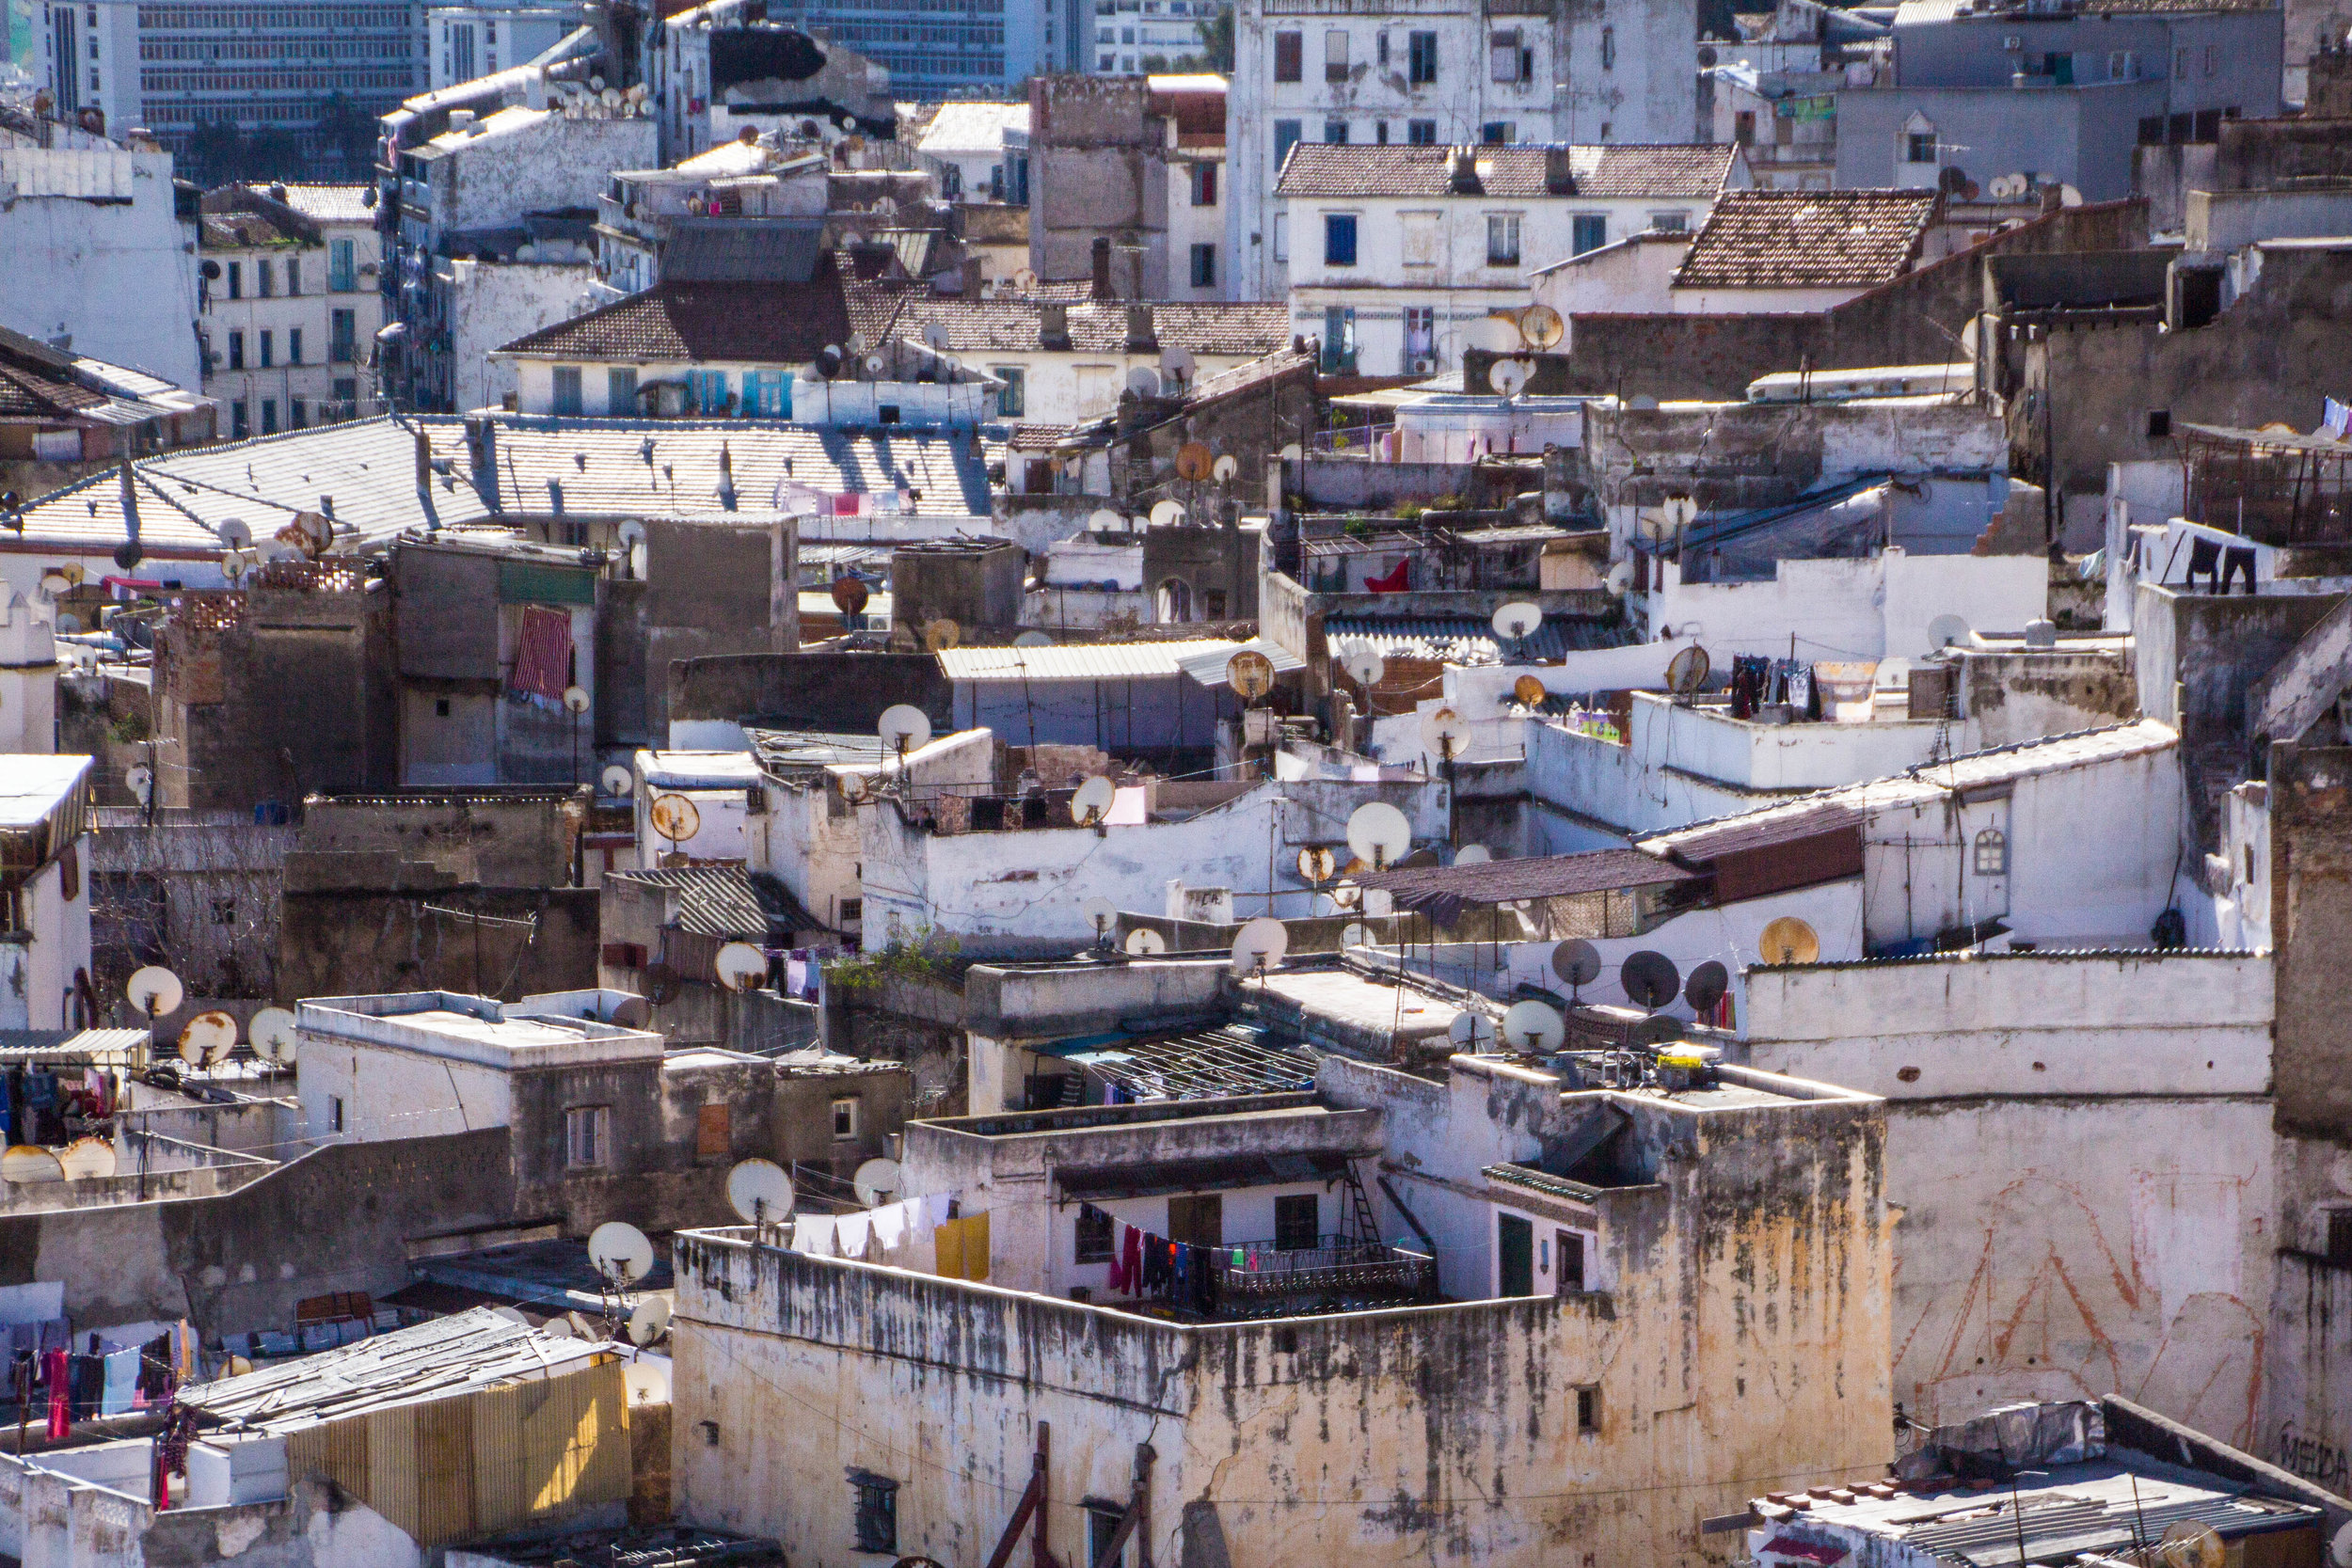 casbah-from-above-algiers-algeria-13.jpg